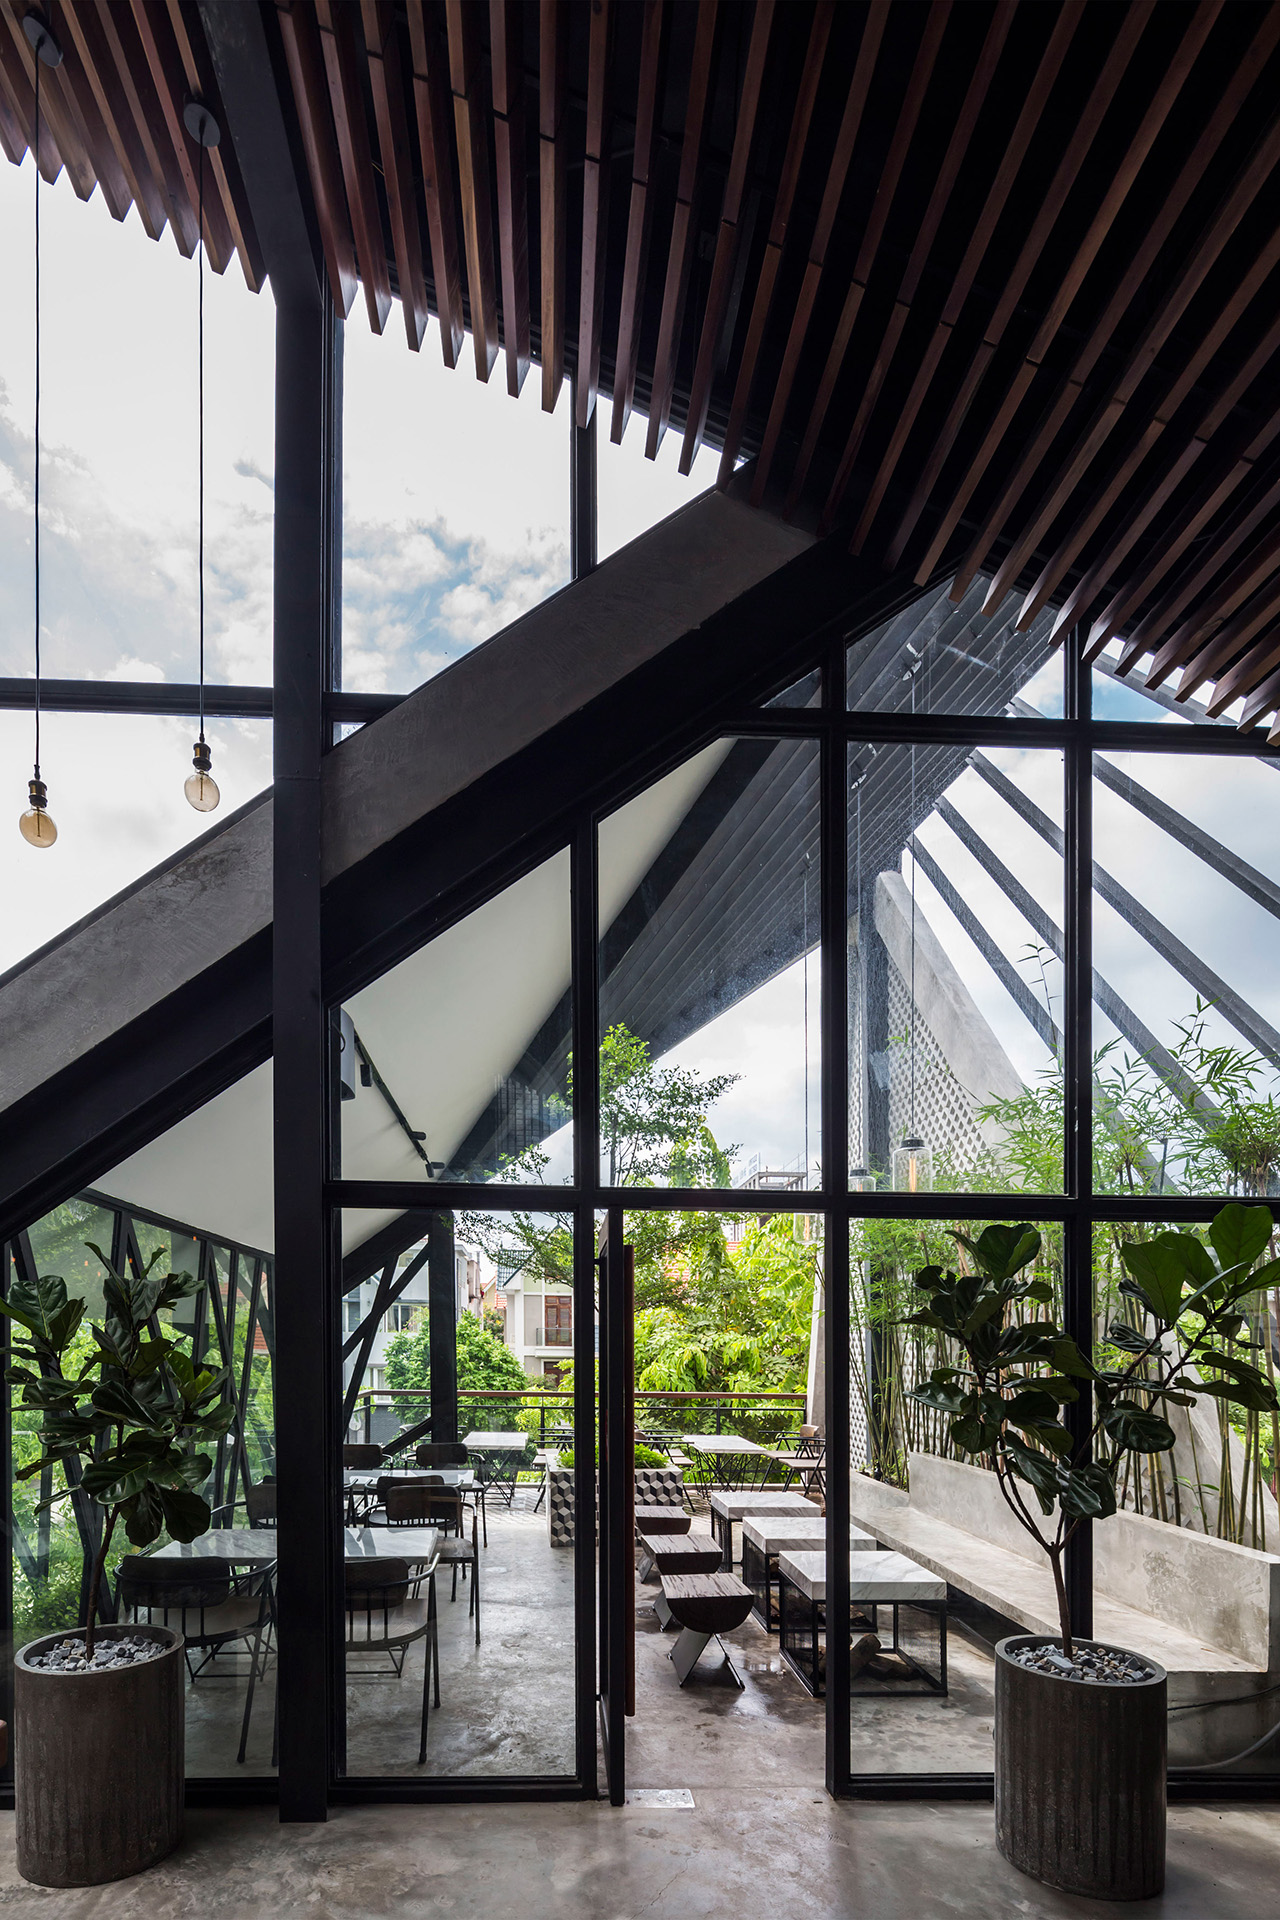 an-garden-cafe-le-house-architecture-public-and-leisure-vietname-hanoi_dezeen_2364_col_22_1280px.jpg